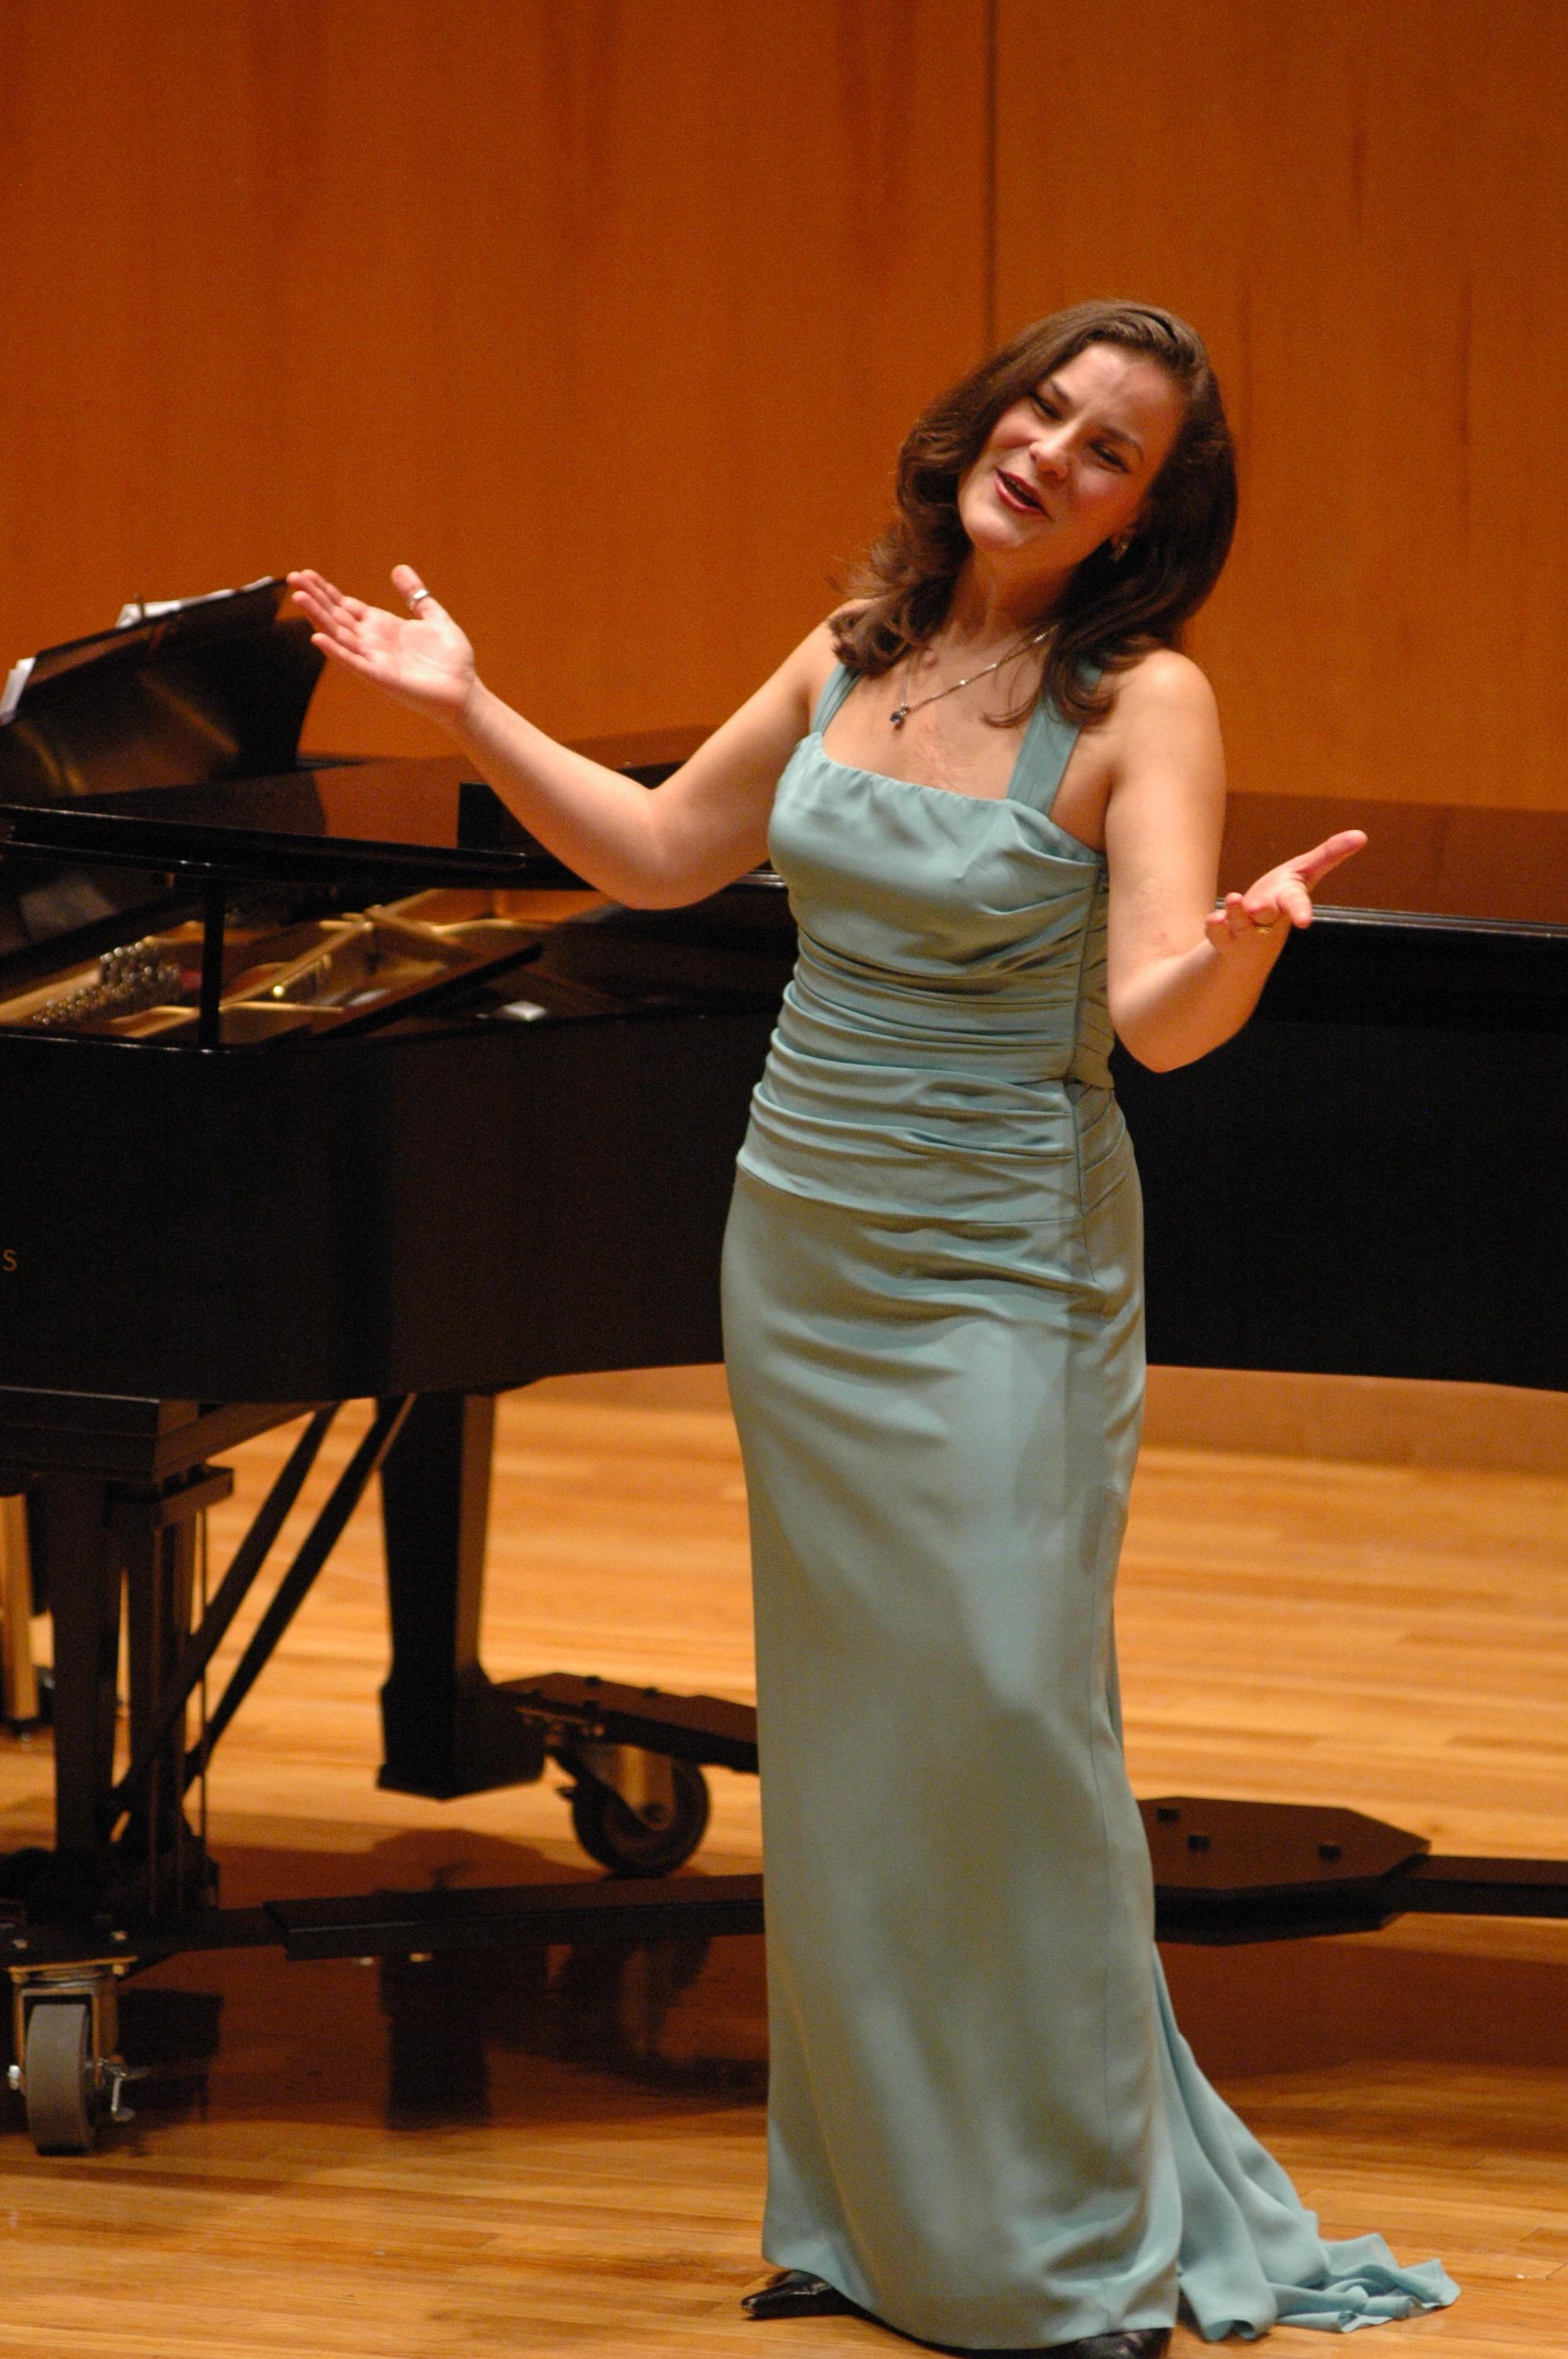 Recital at University of West Florida